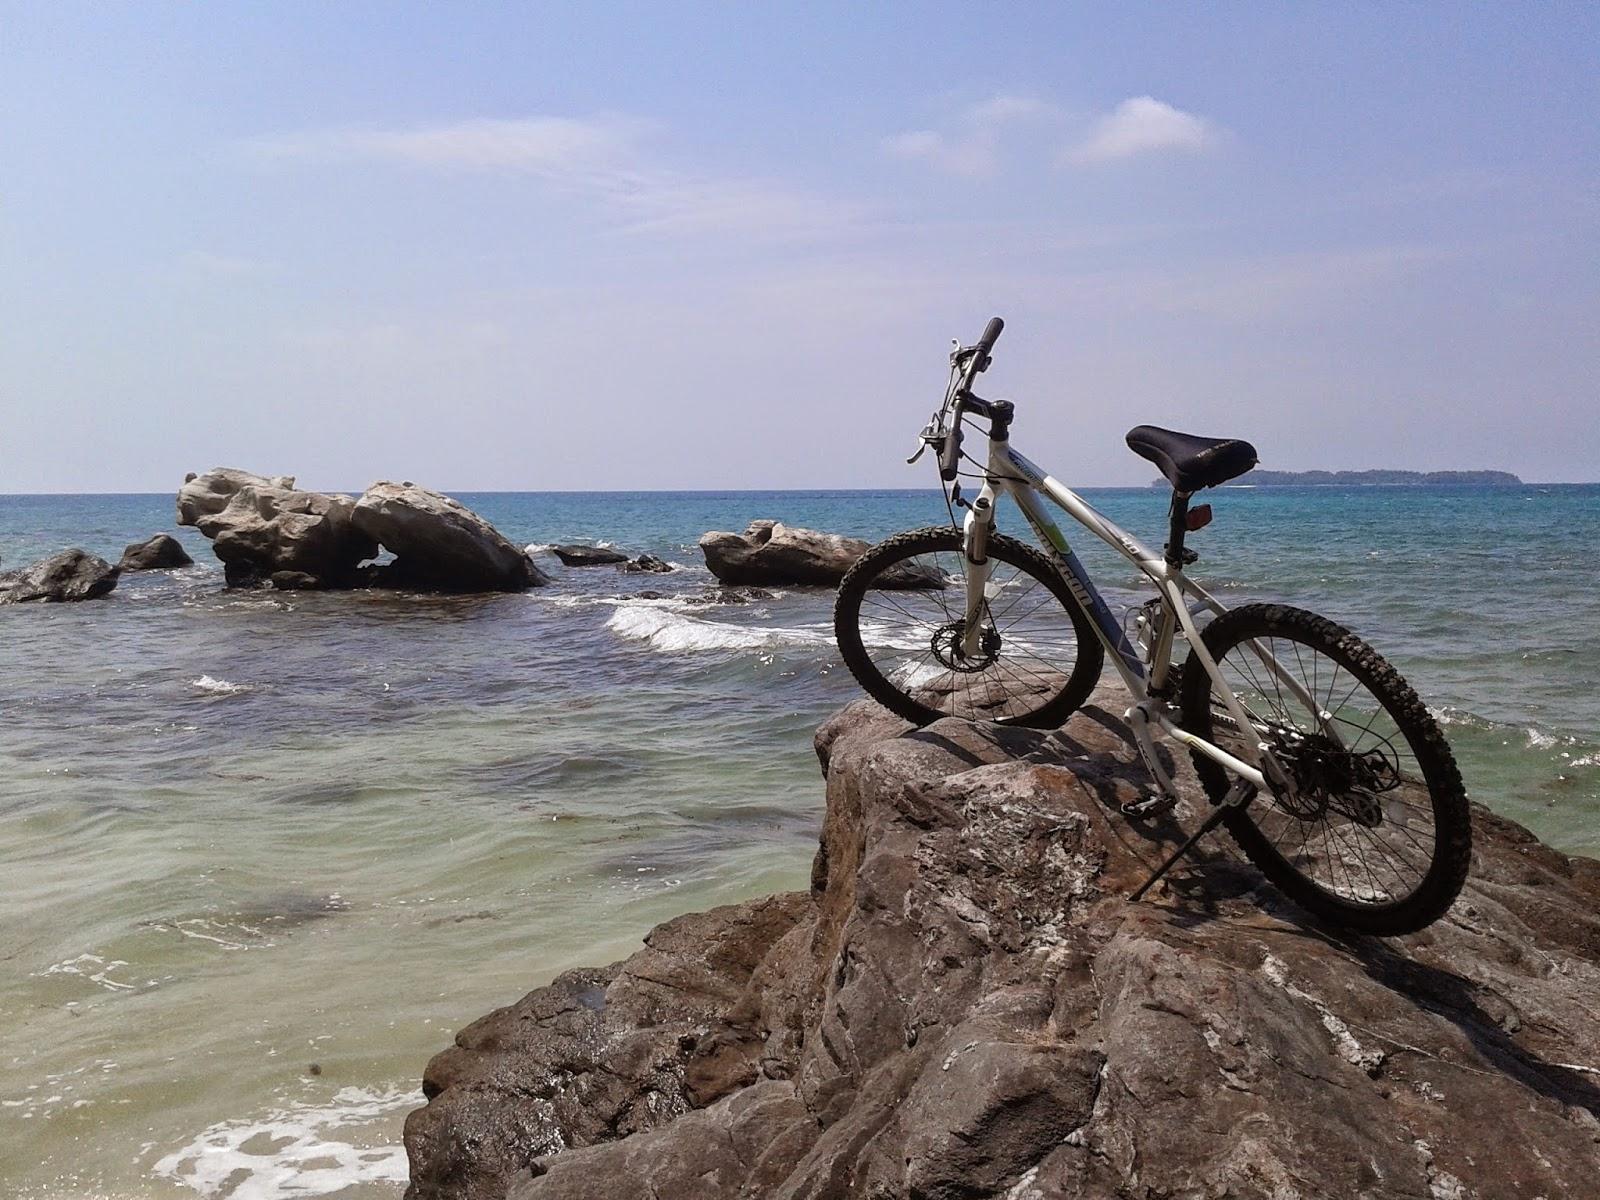 Di Pantai Batu Putih dan Jembatan Cinta, Karimunjawa